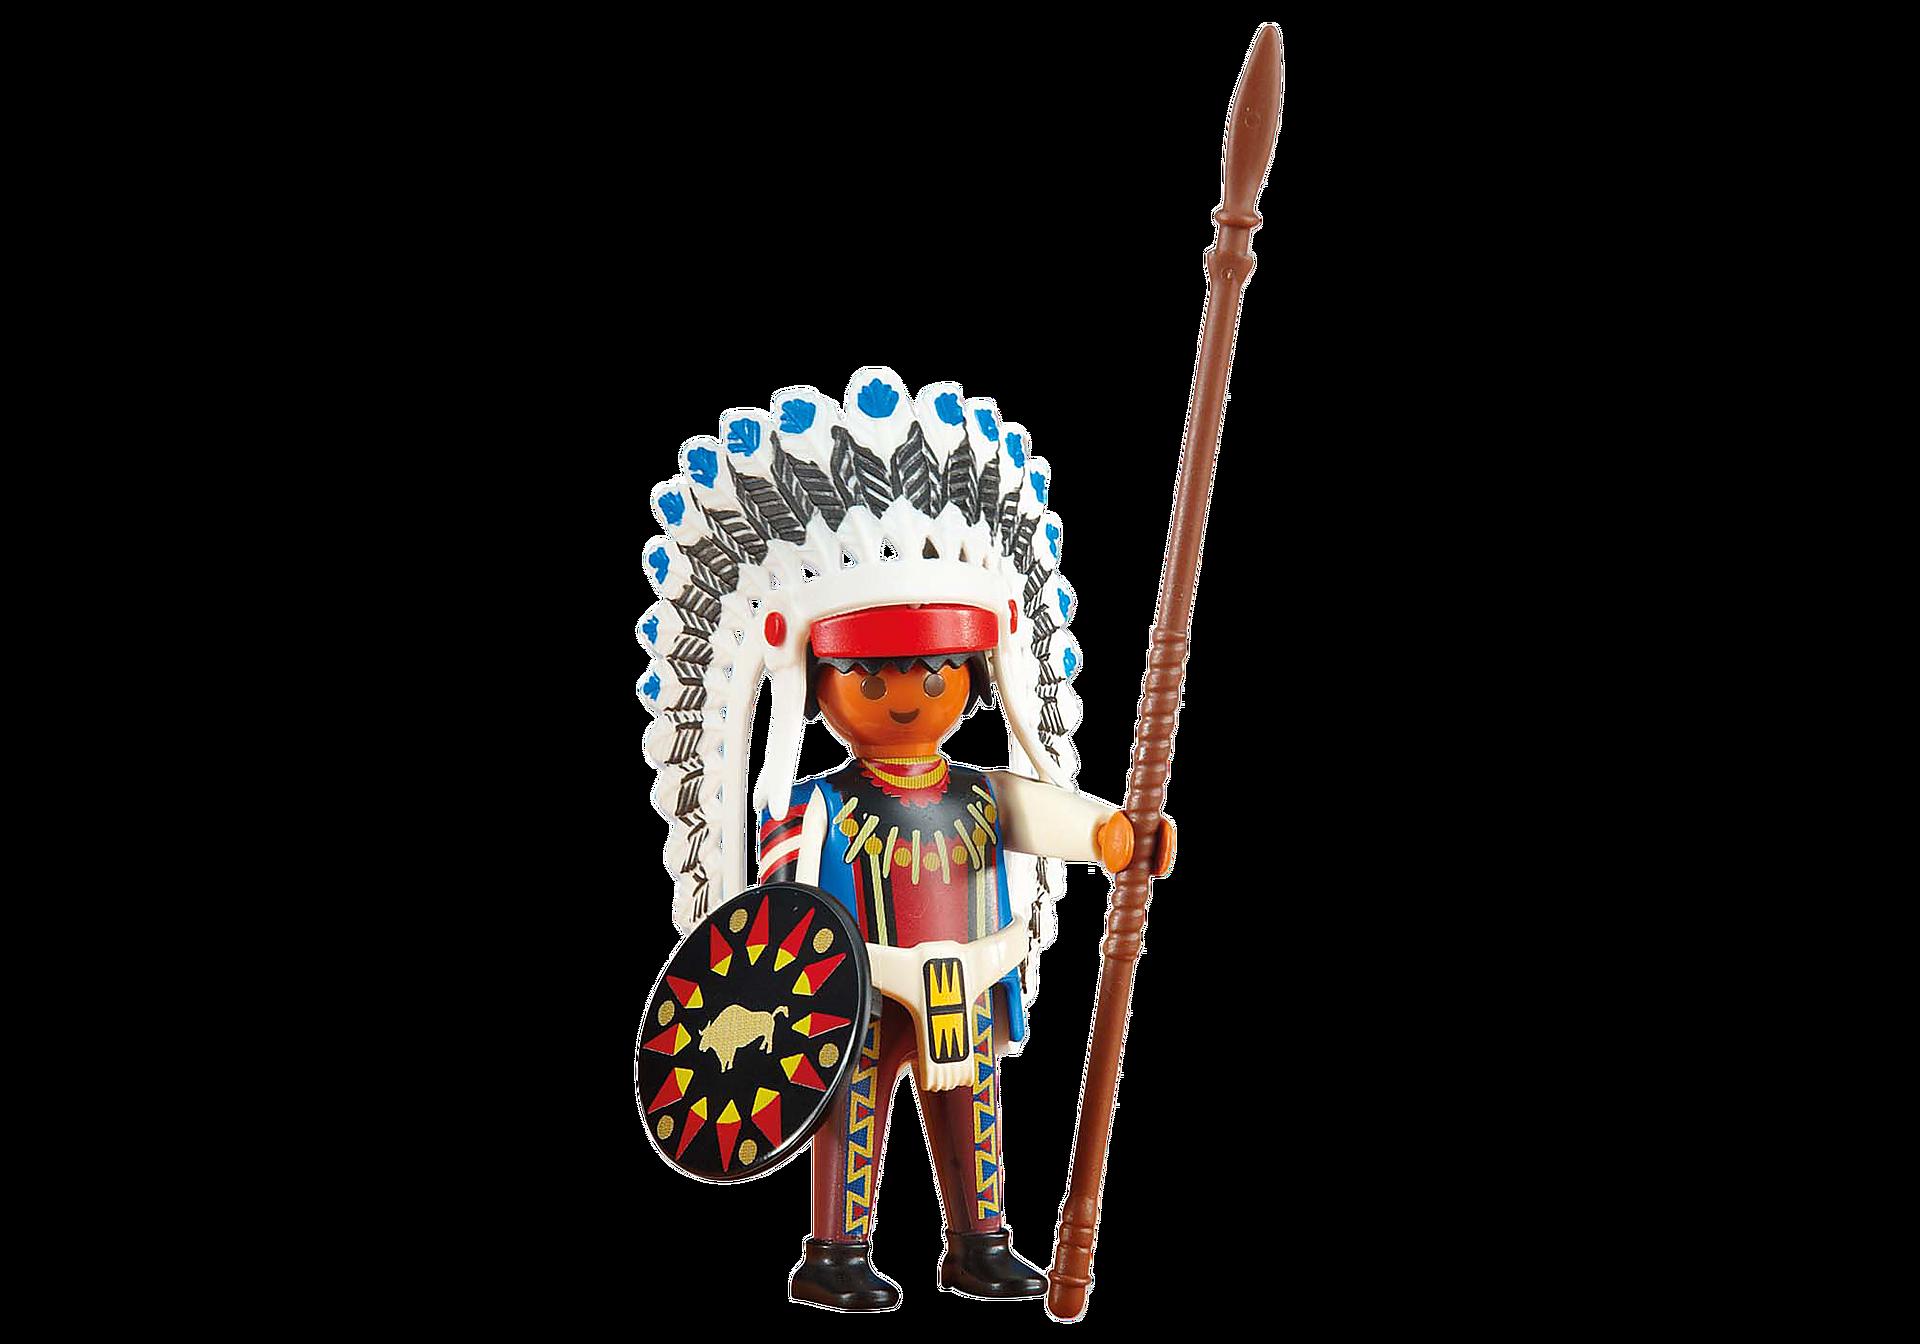 6271 Chefe Índio zoom image1